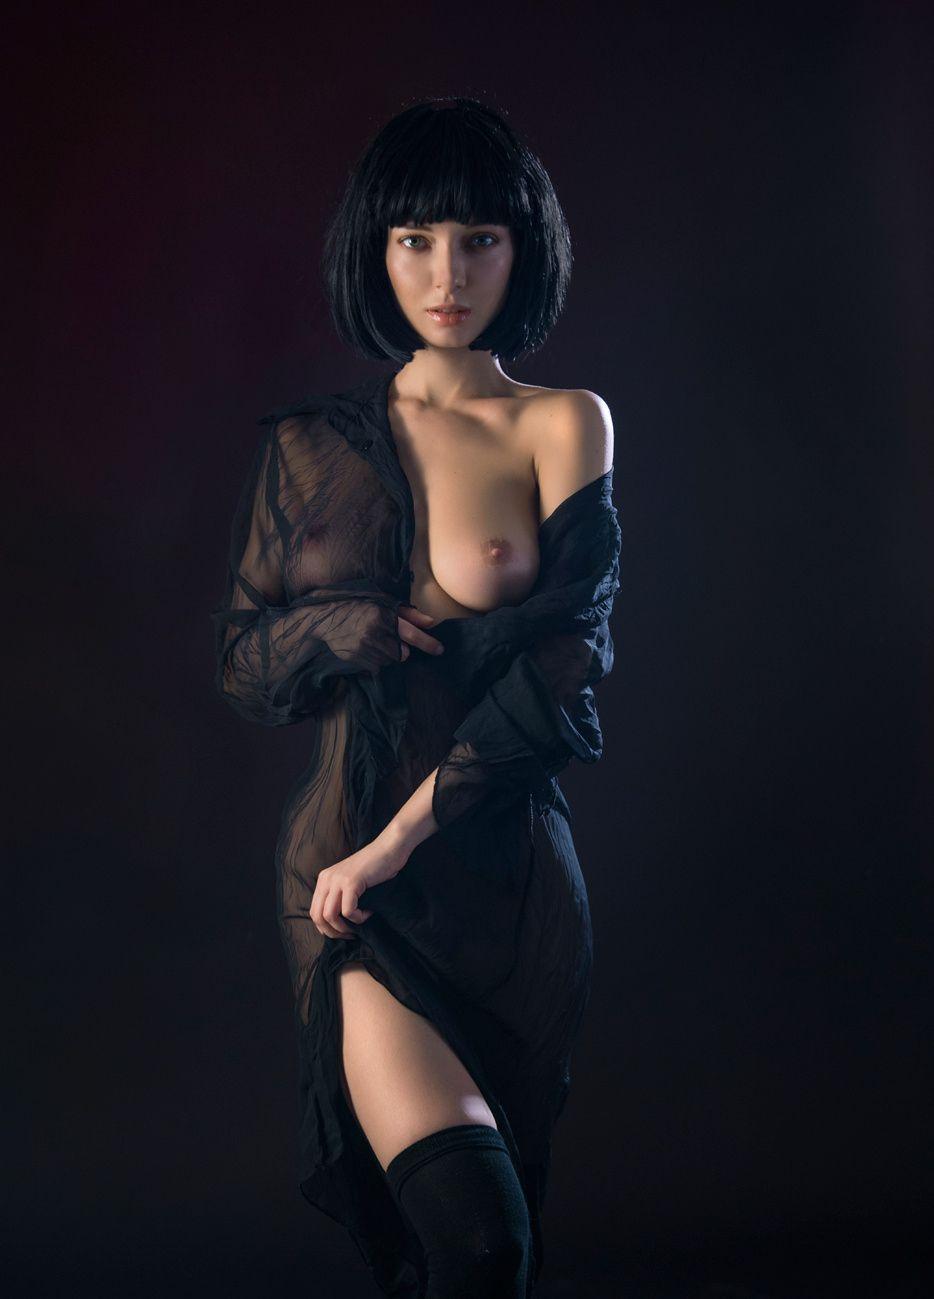 Fran Meric Desnuda natali - null   cool girl, girl photos, beautiful women